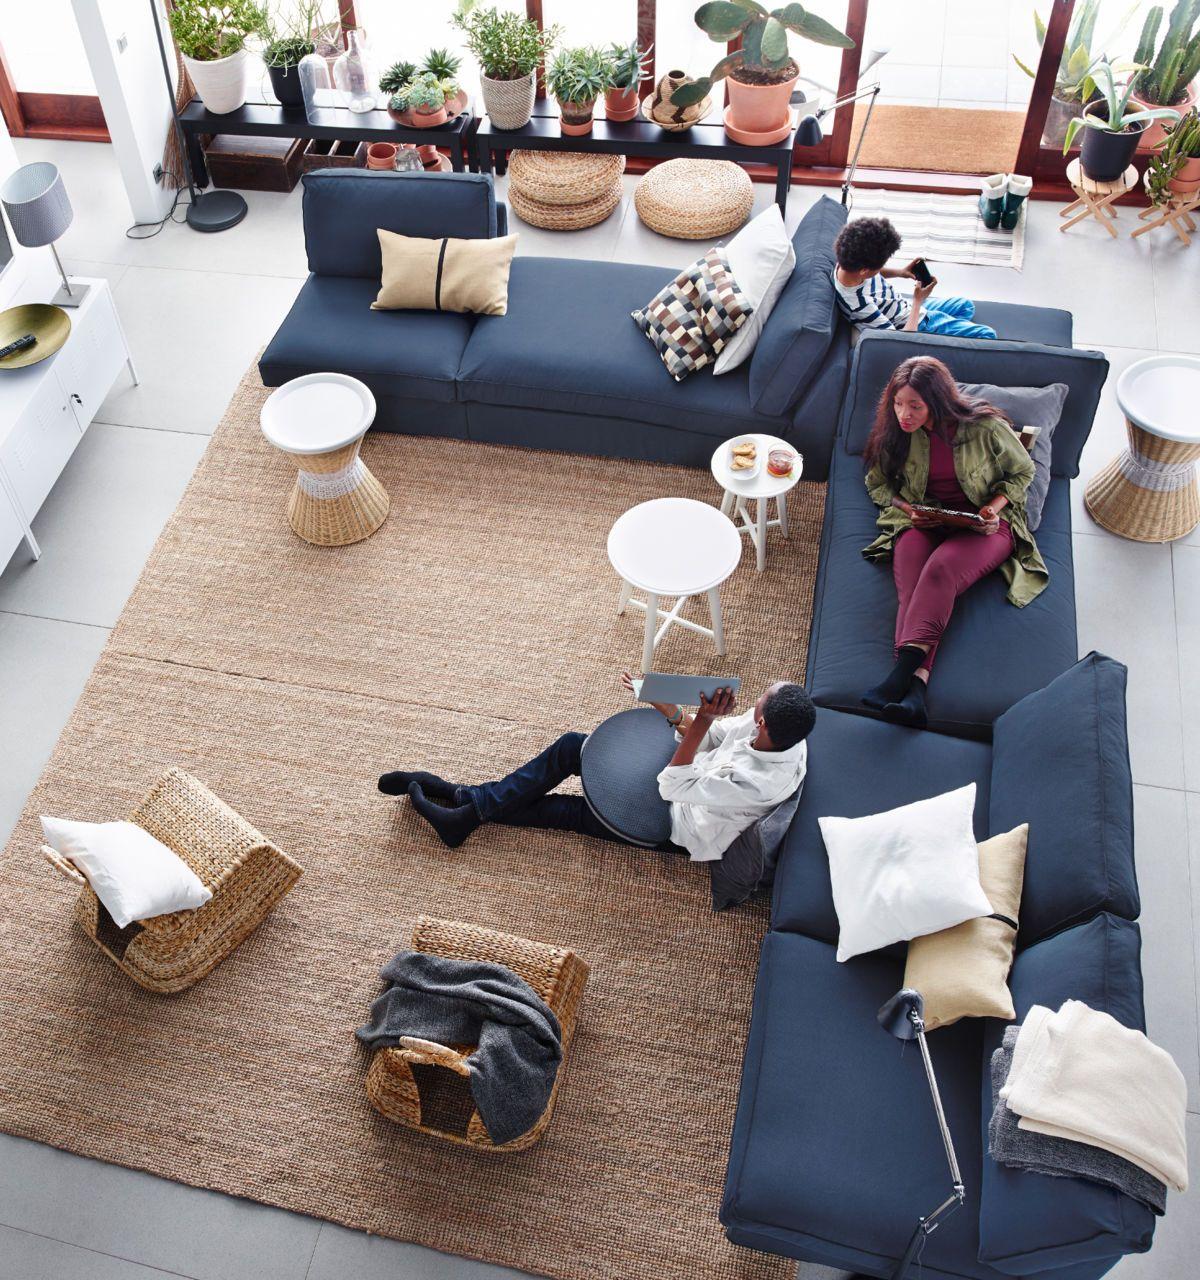 IKEA Catalogus 2016 | Home inspiration | Pinterest | Espacios y Comprar